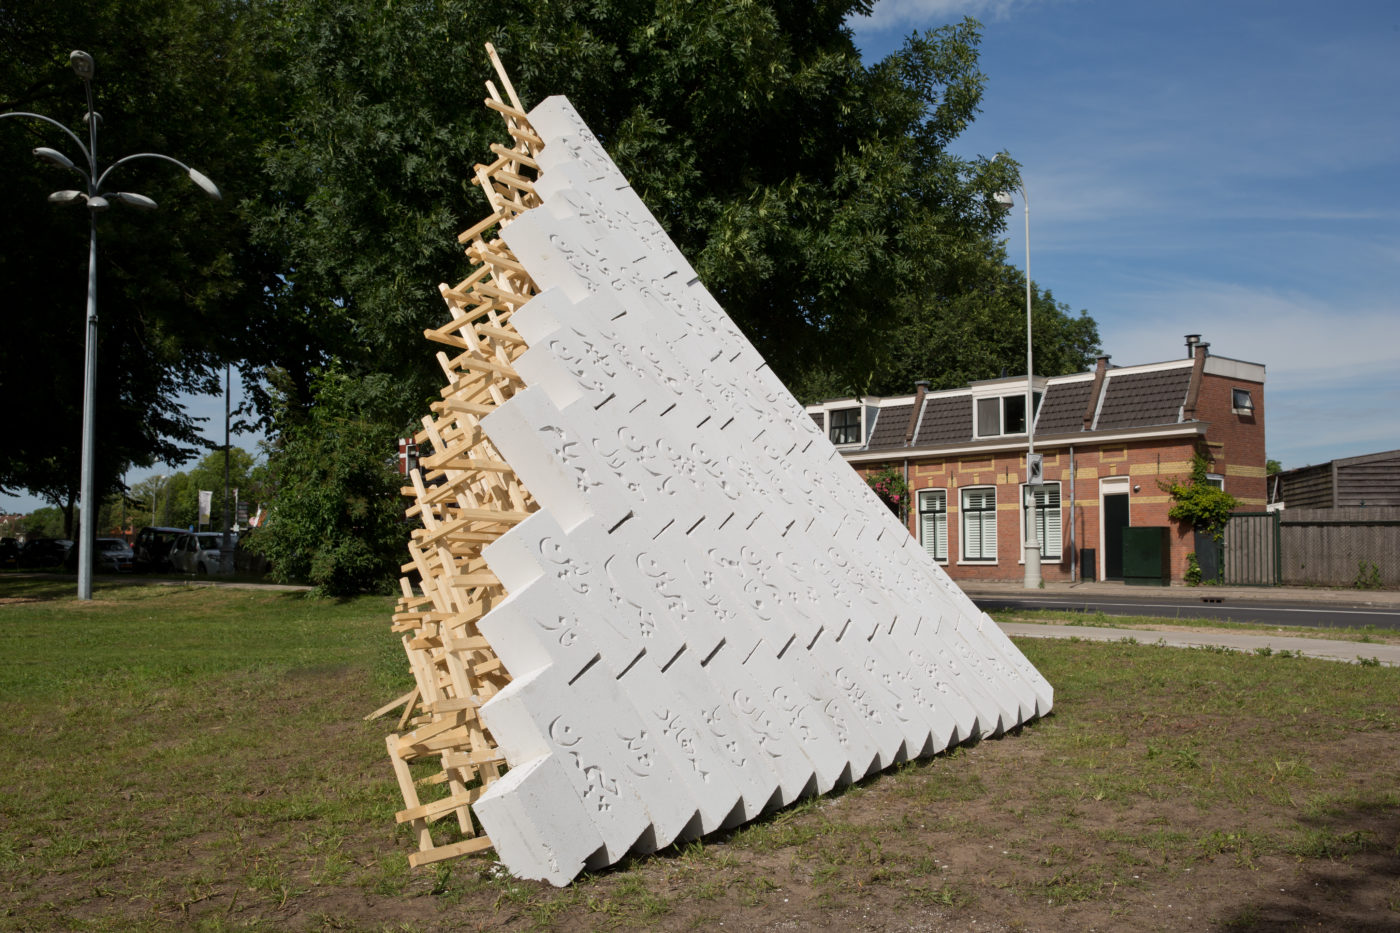 Walid Siti - Monument to the Unsung - photo (c) Maarten van Haaff